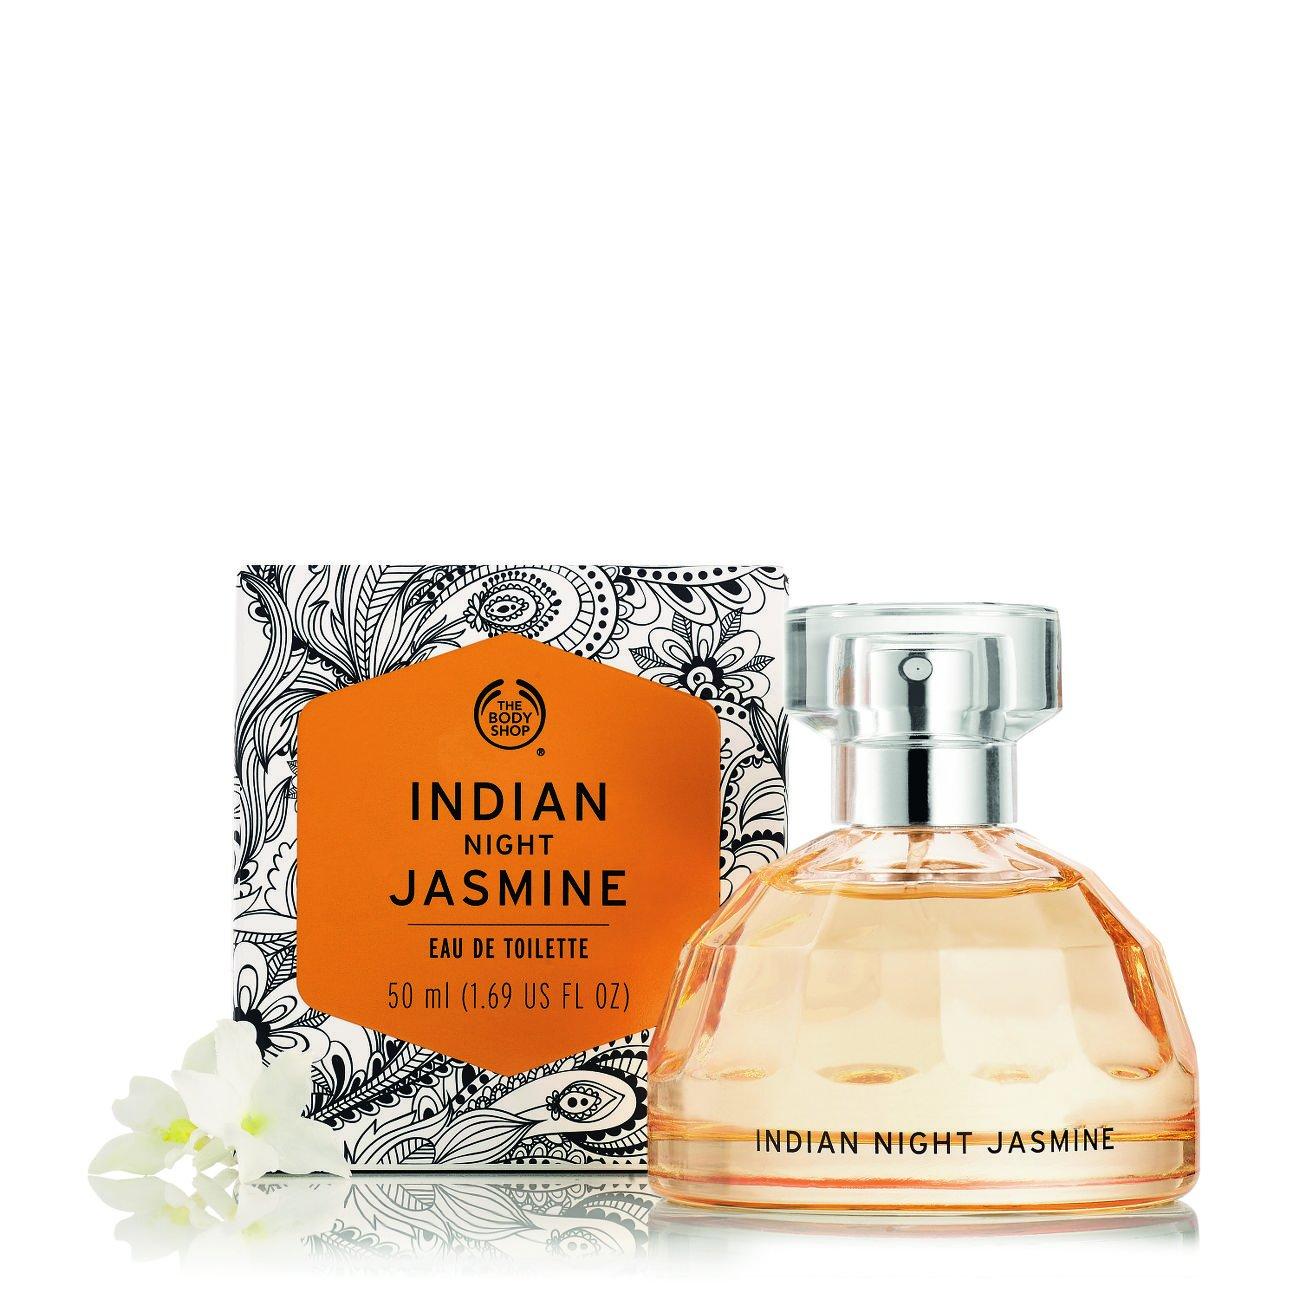 The Body Shop Indian Night Jasmine Eau De Toilette, 1.69 fl. oz.